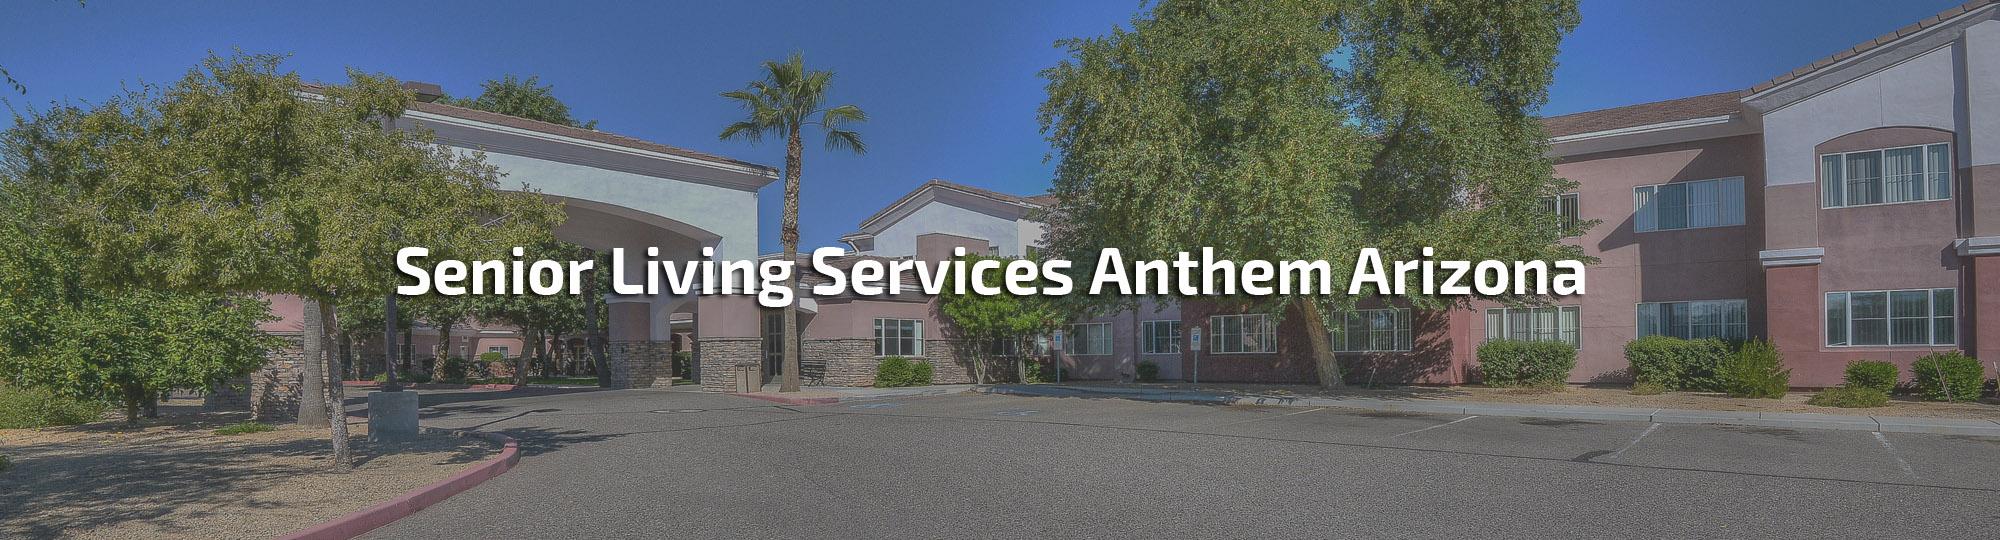 Senior Living Services Anthem Arizona